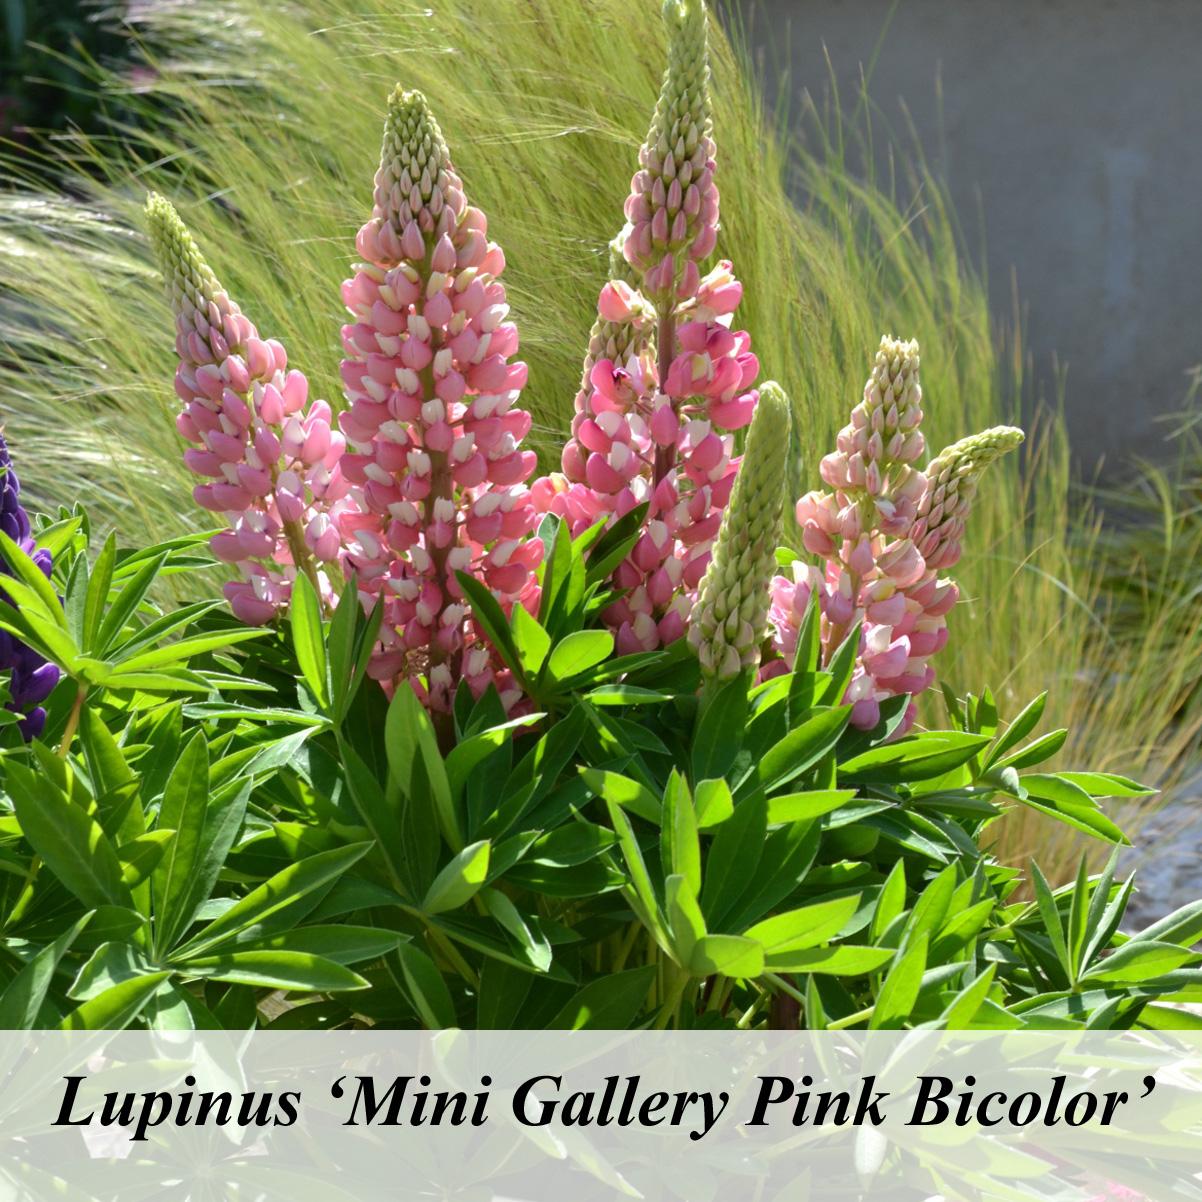 Lupinus mini gallery Pink Bicolor  Lupin  Lupine  Nos vgtaux  Jardin2m